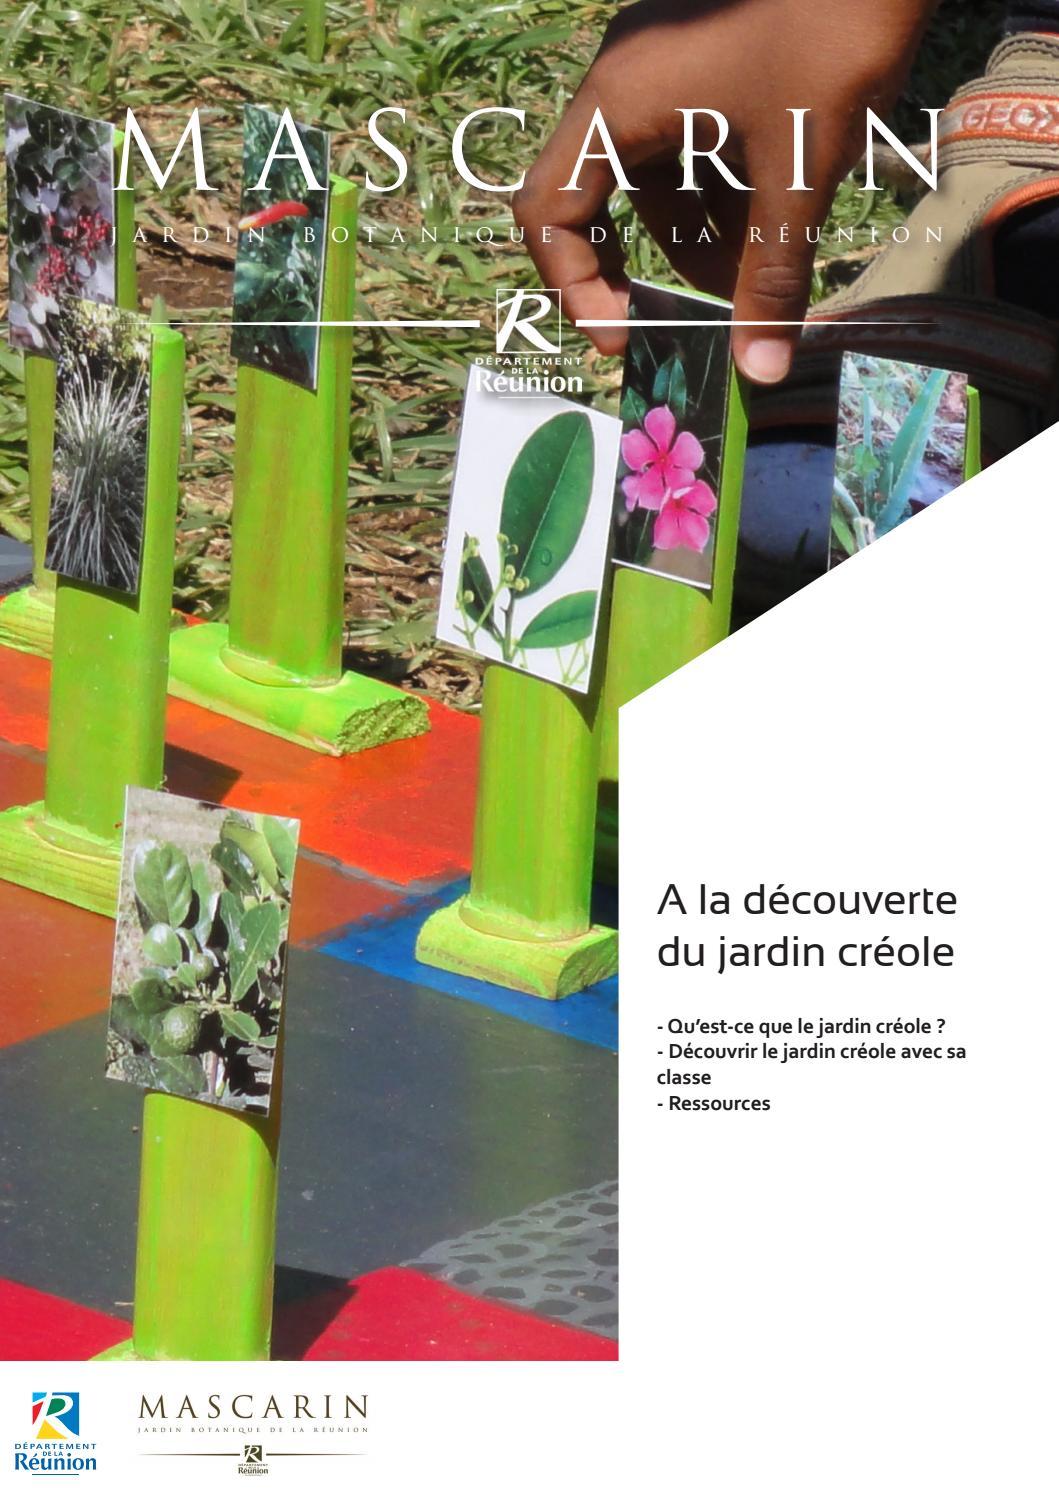 Eloigner Les Fourmis Au Jardin a la découverte du jardin créolemascarin jbr - issuu